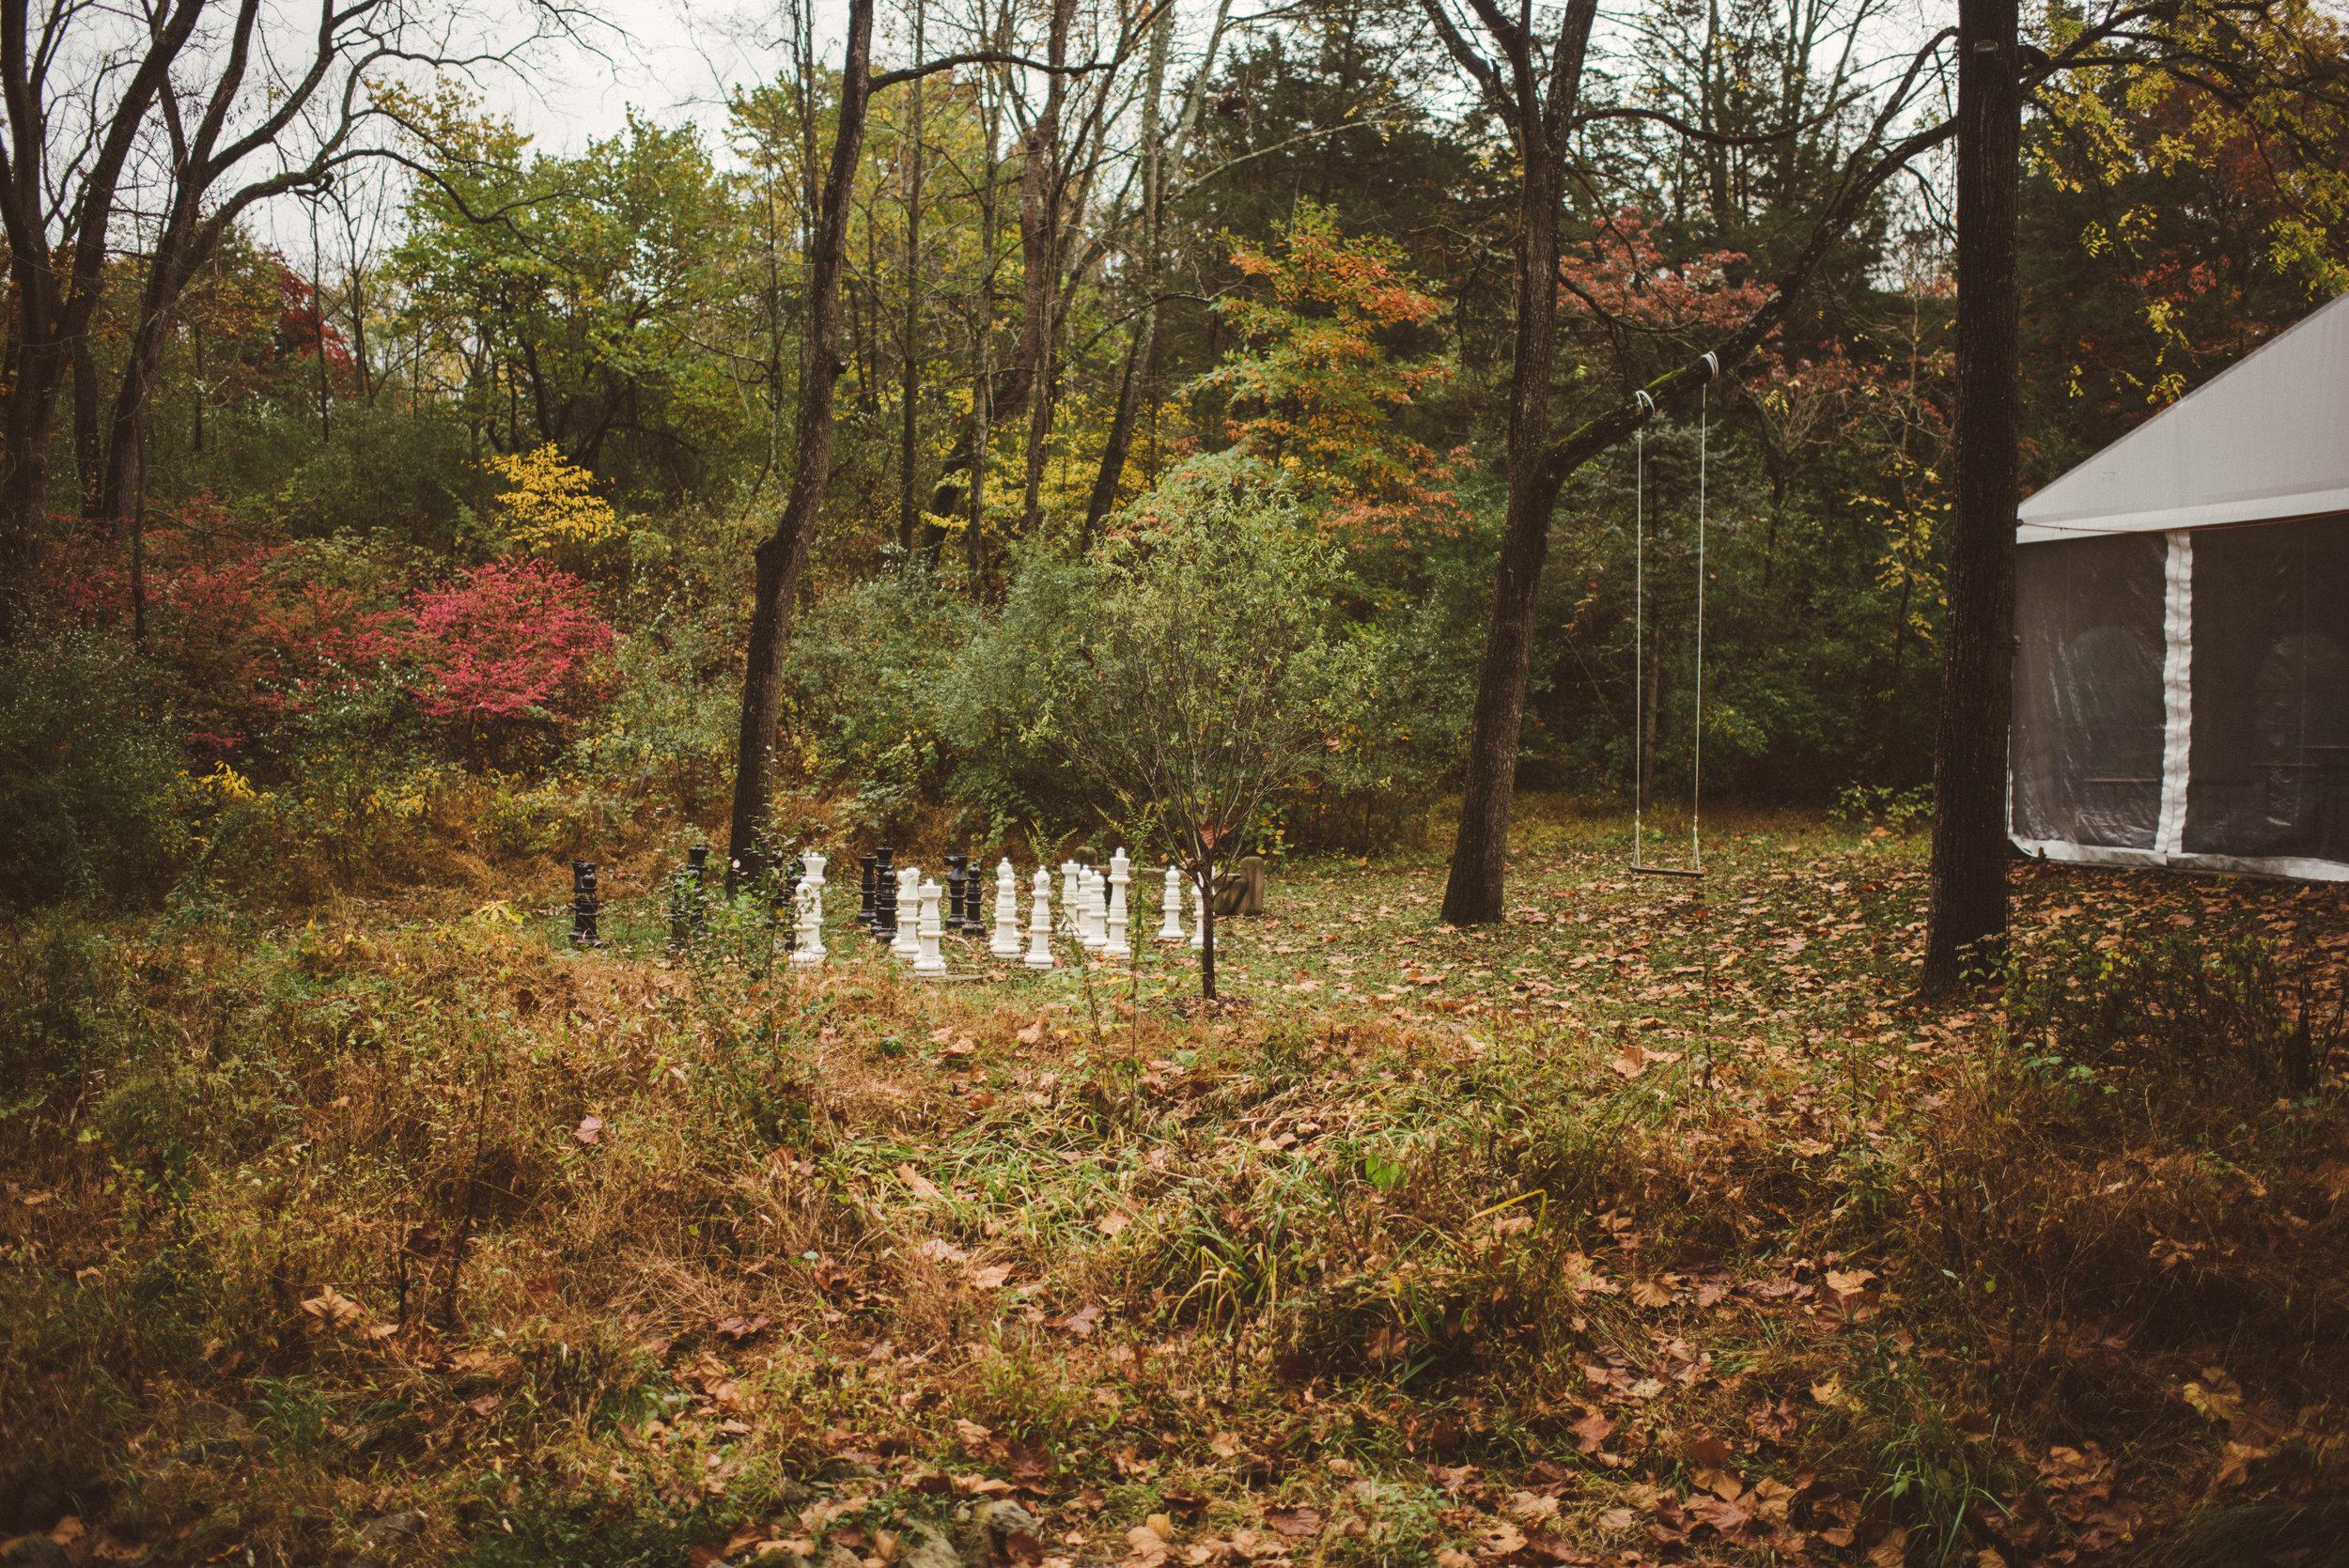 JACQUELINE & ANDREW WARSHAWER -BROOKMILL FARM FALL WEDDING - INTIMATE WEDDING PHOTOGRAPHER - TWOTWENTY by CHI-CHI AGBIM-4.jpg